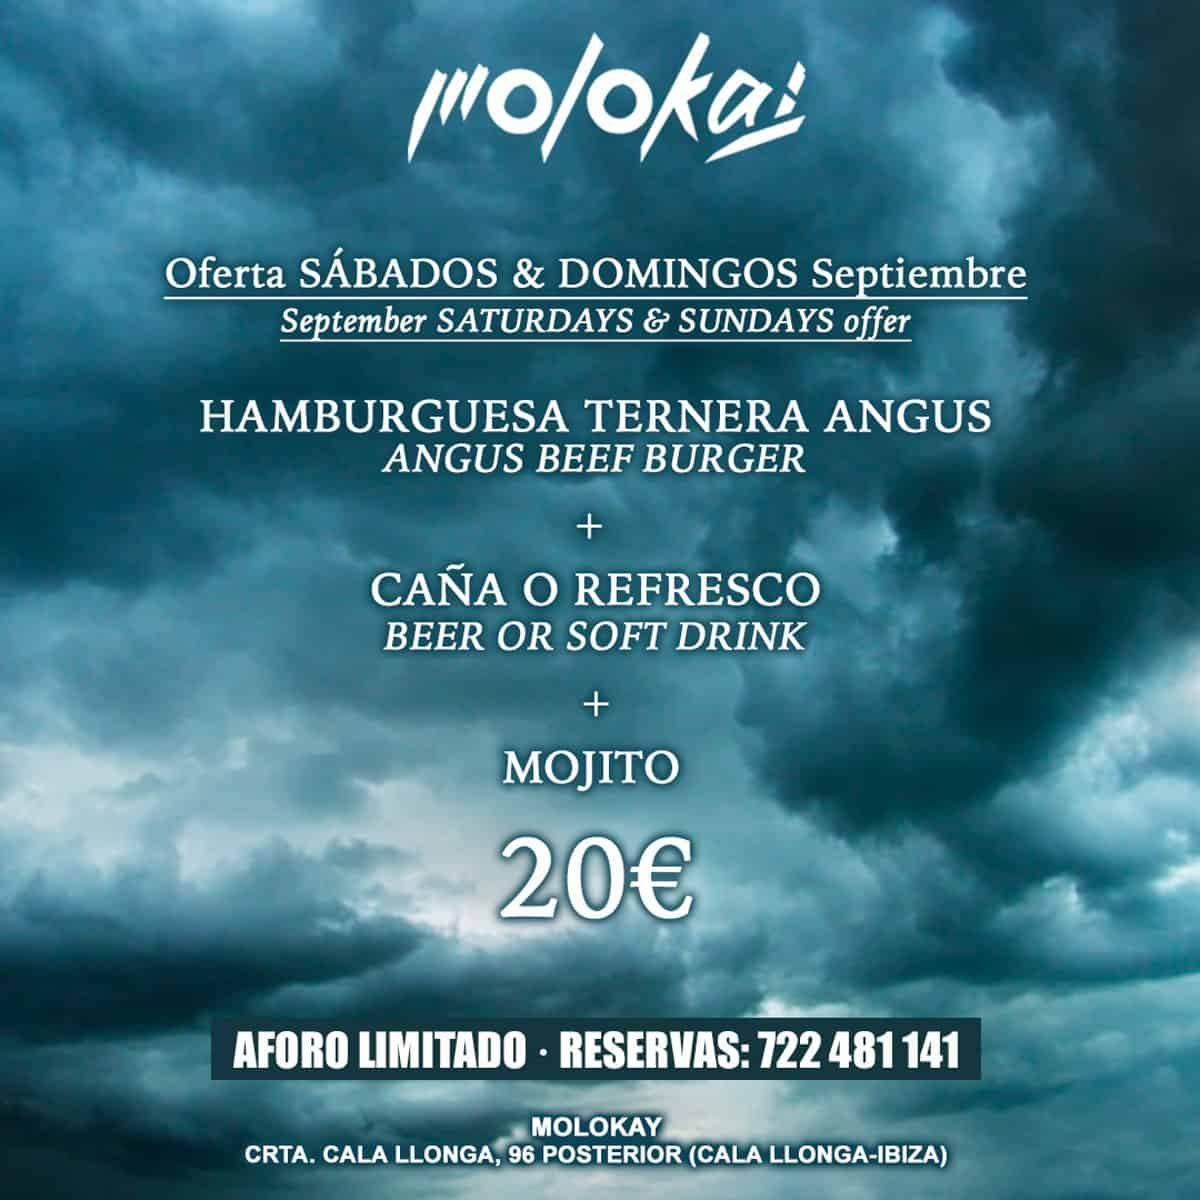 molokay-ibiza-aanbieding-weekends-september-2021-welcometoibiza